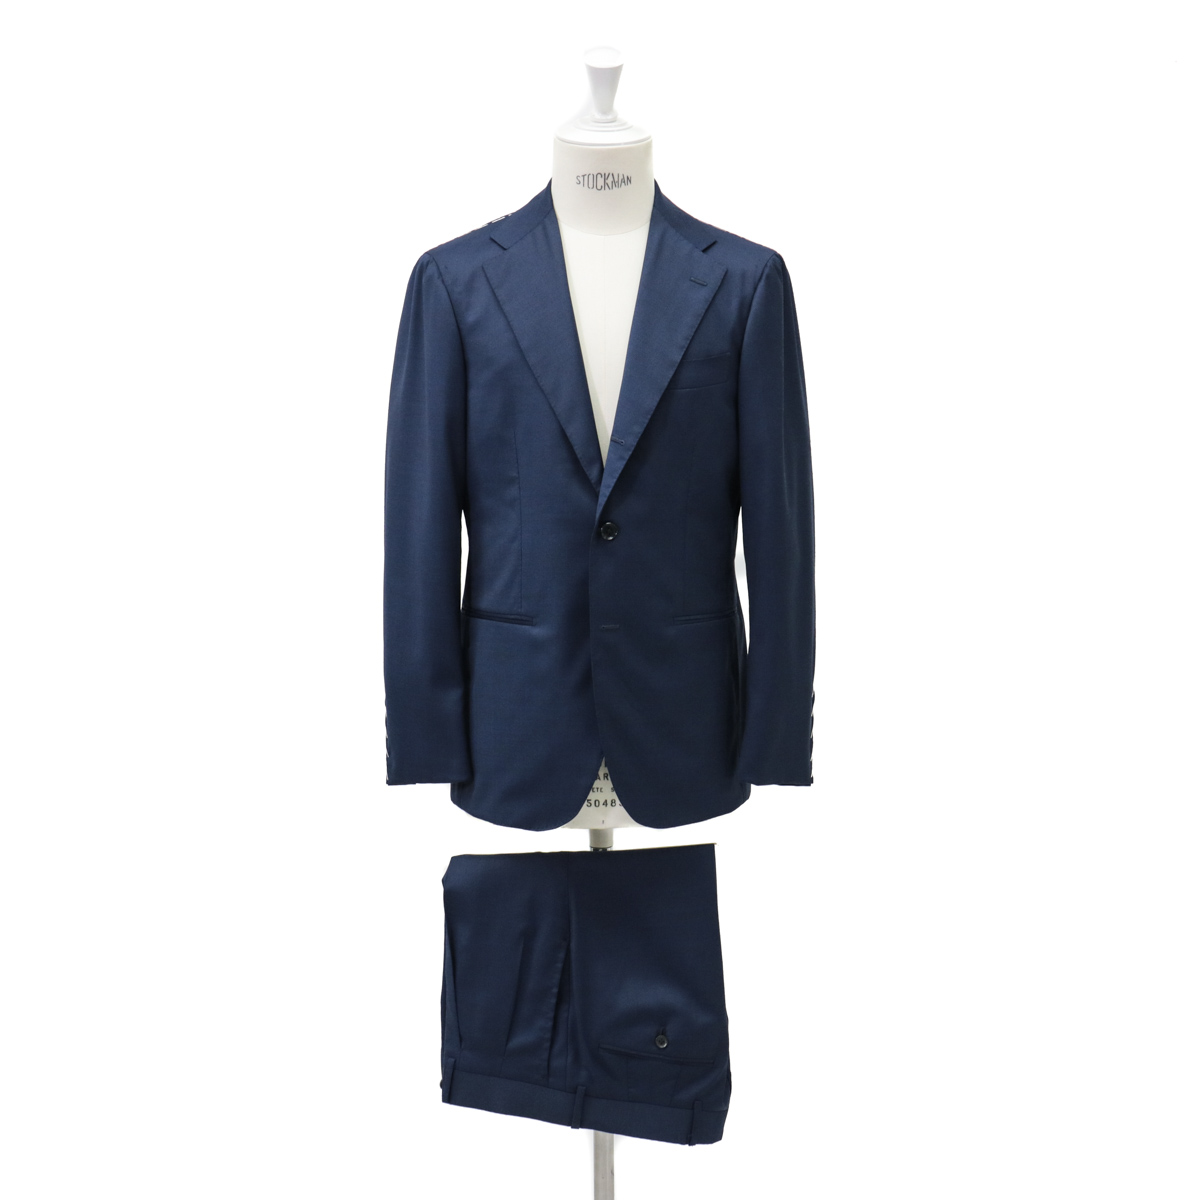 RING JACKET リングヂャケットModel No-269EH S-178HLORO PIANA3Bスーツ【無地・ネイビー】